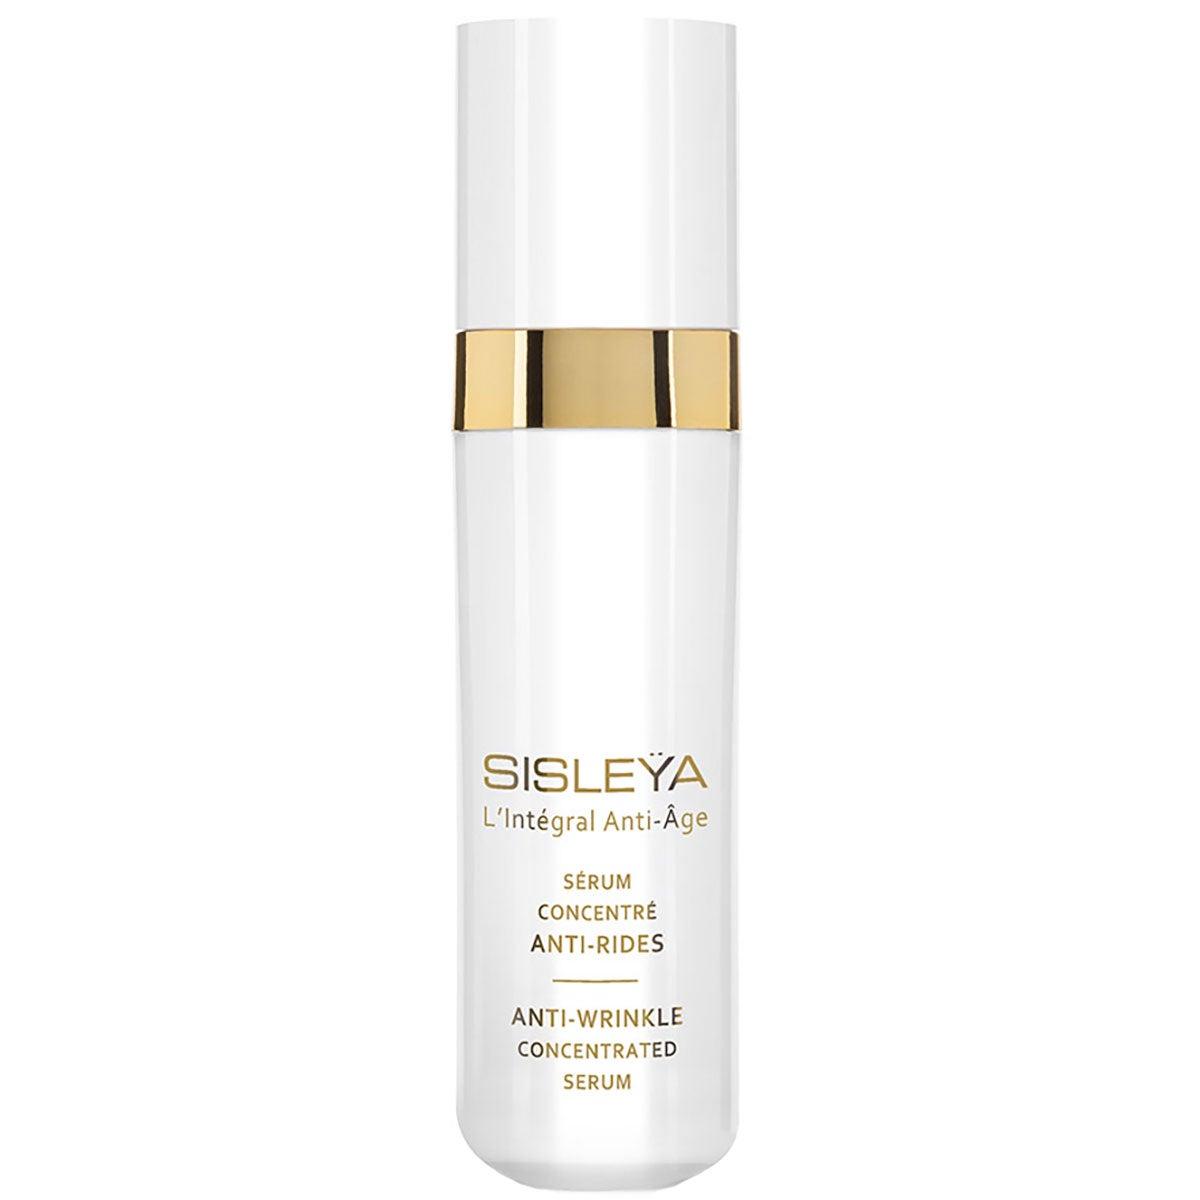 Sisleÿa l'Integral Anti-Wrinkle Concentrated Serum 30 ml Sisley Serum & Olja